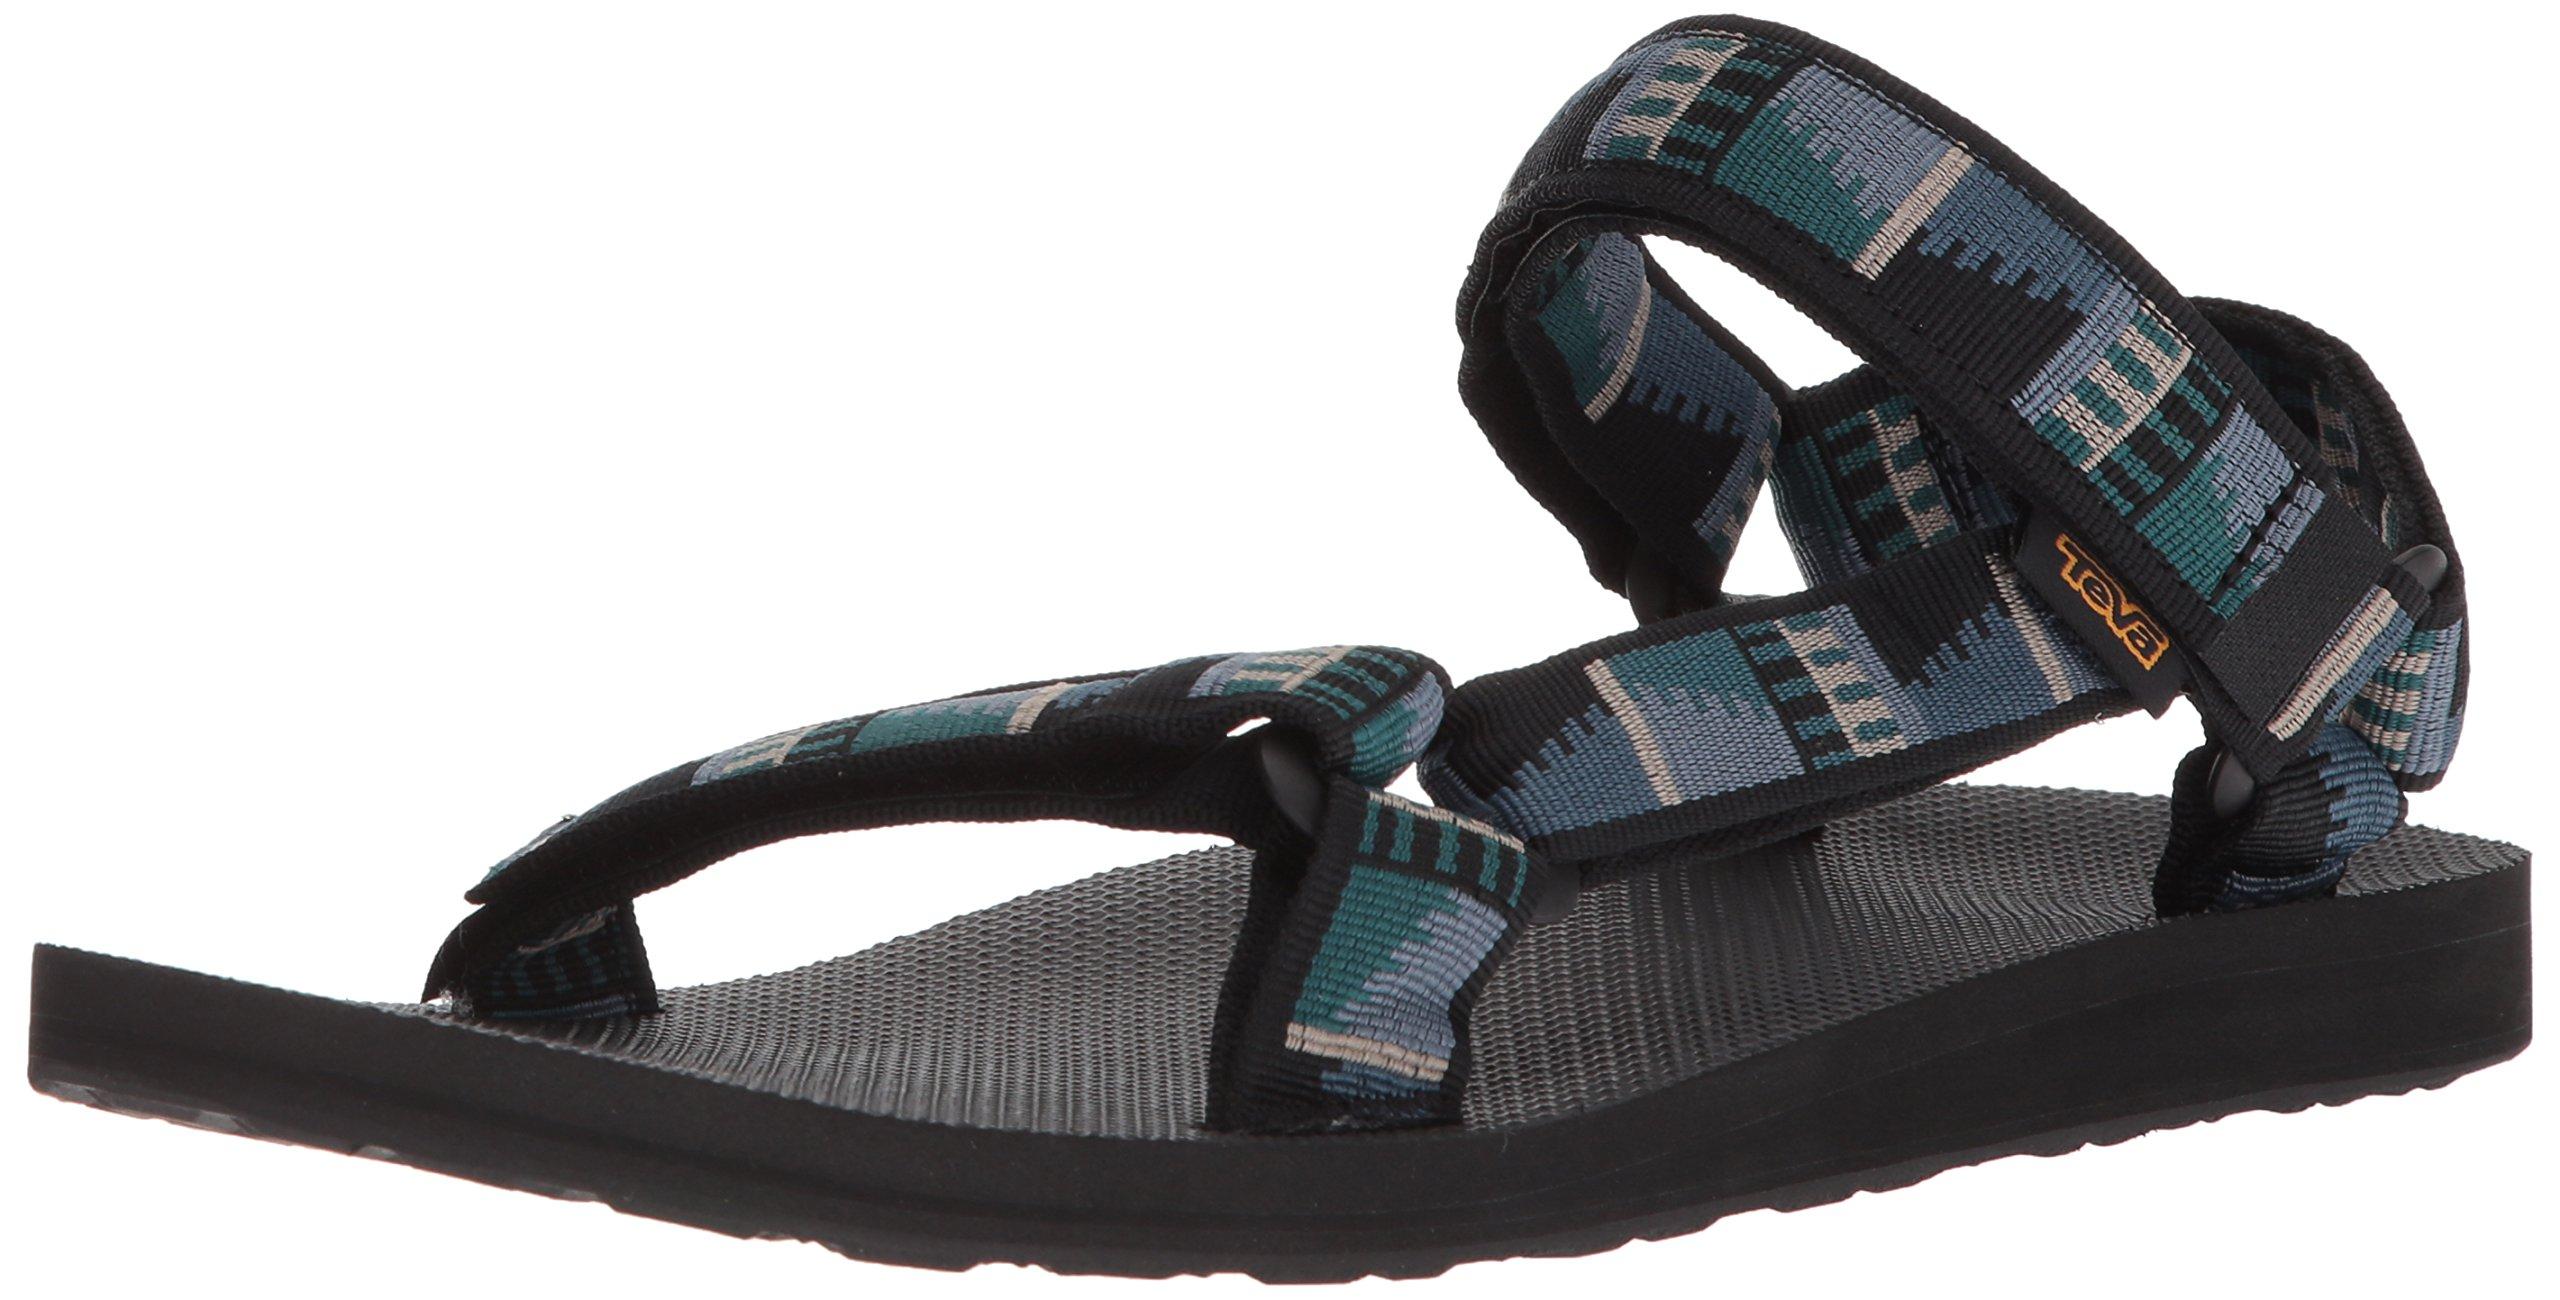 Teva Men's M Original Universal Sport Sandal, Peaks Black, 9 M US